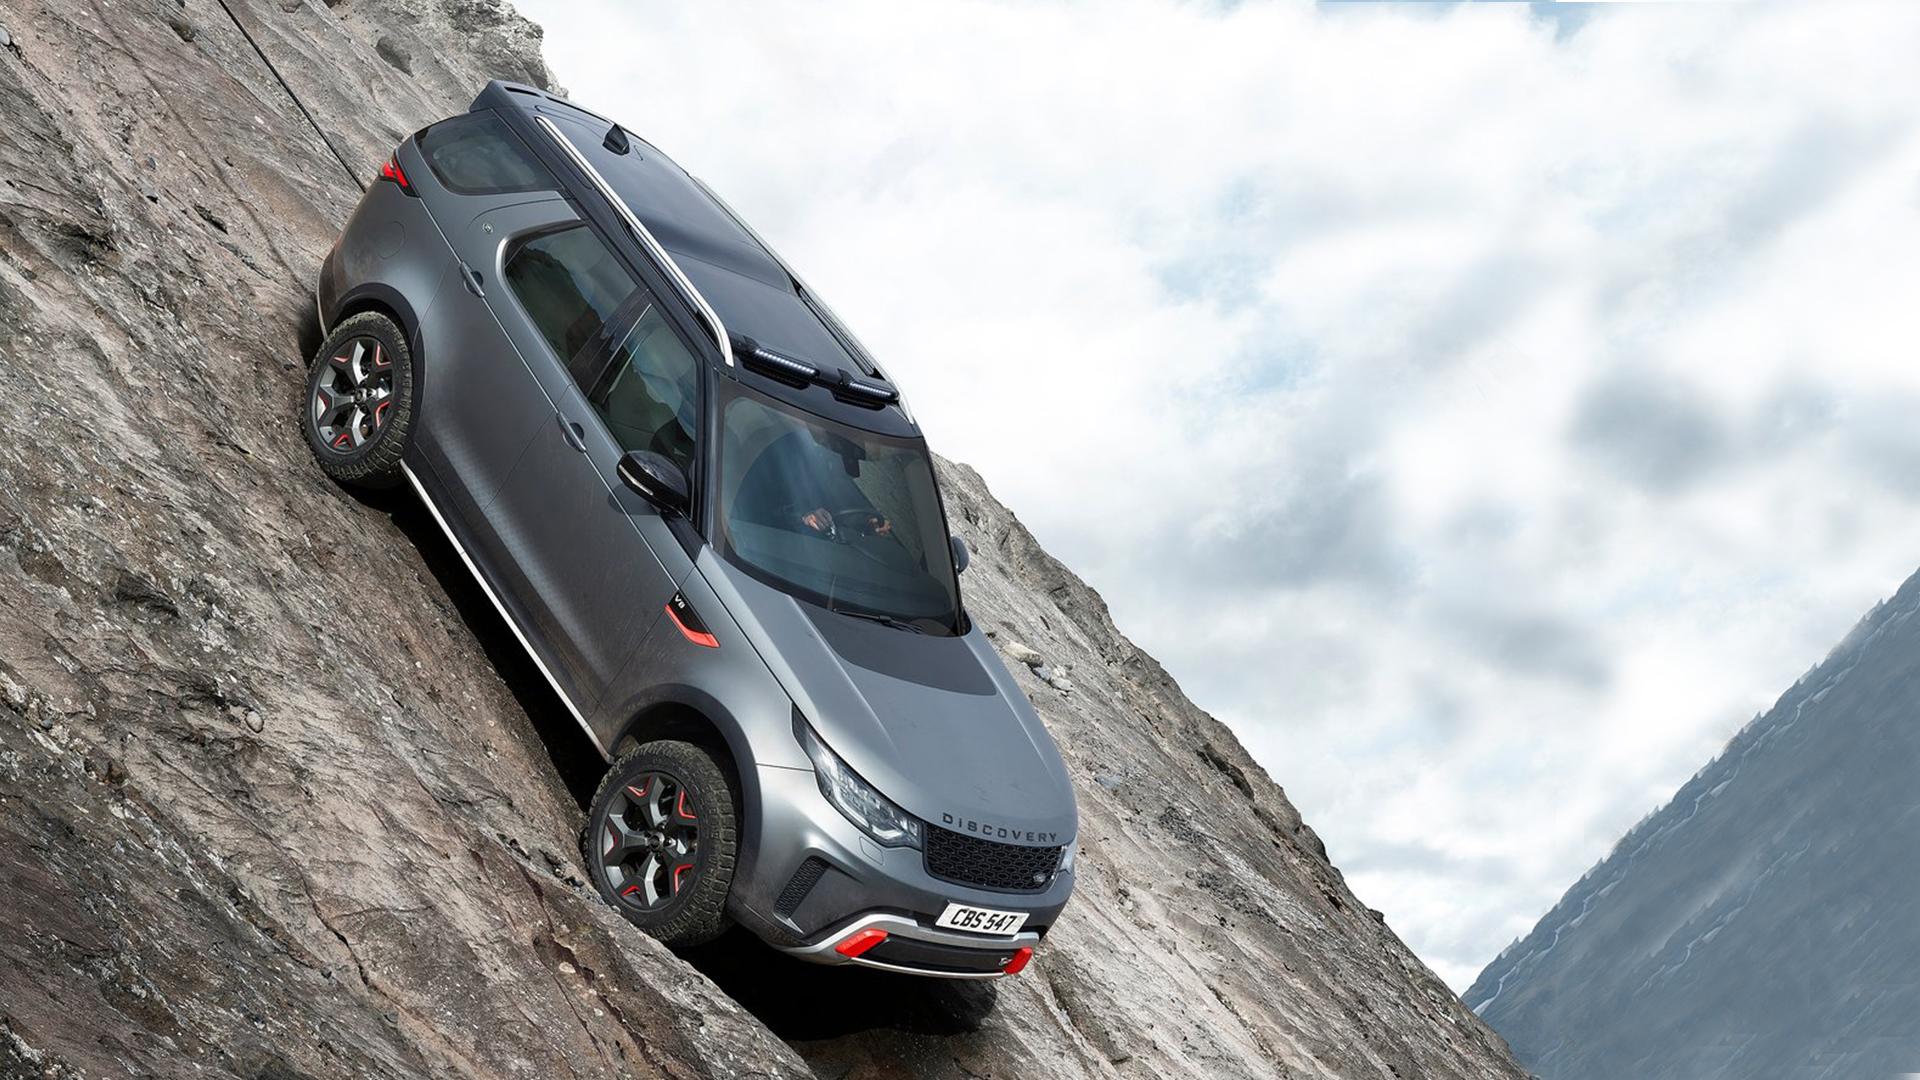 Land Rover Discovery 2018 Svx Exterior Car Photos Overdrive